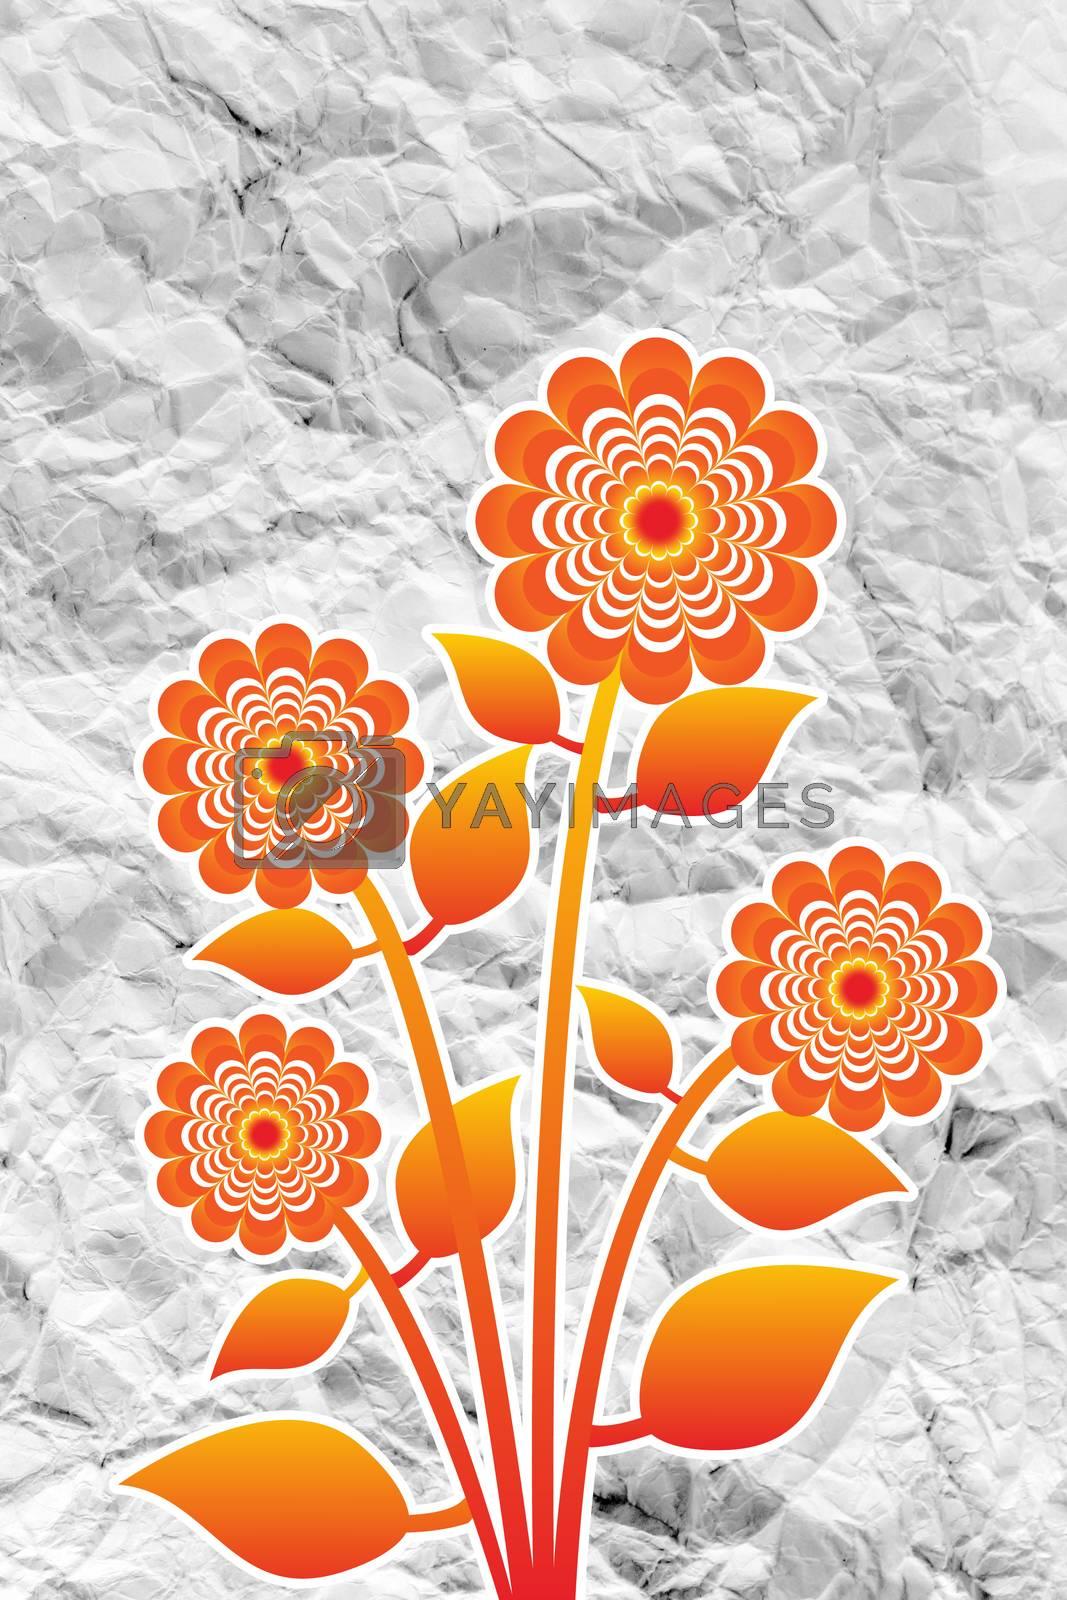 Flowers design on crumpled paper by kiddaikiddee